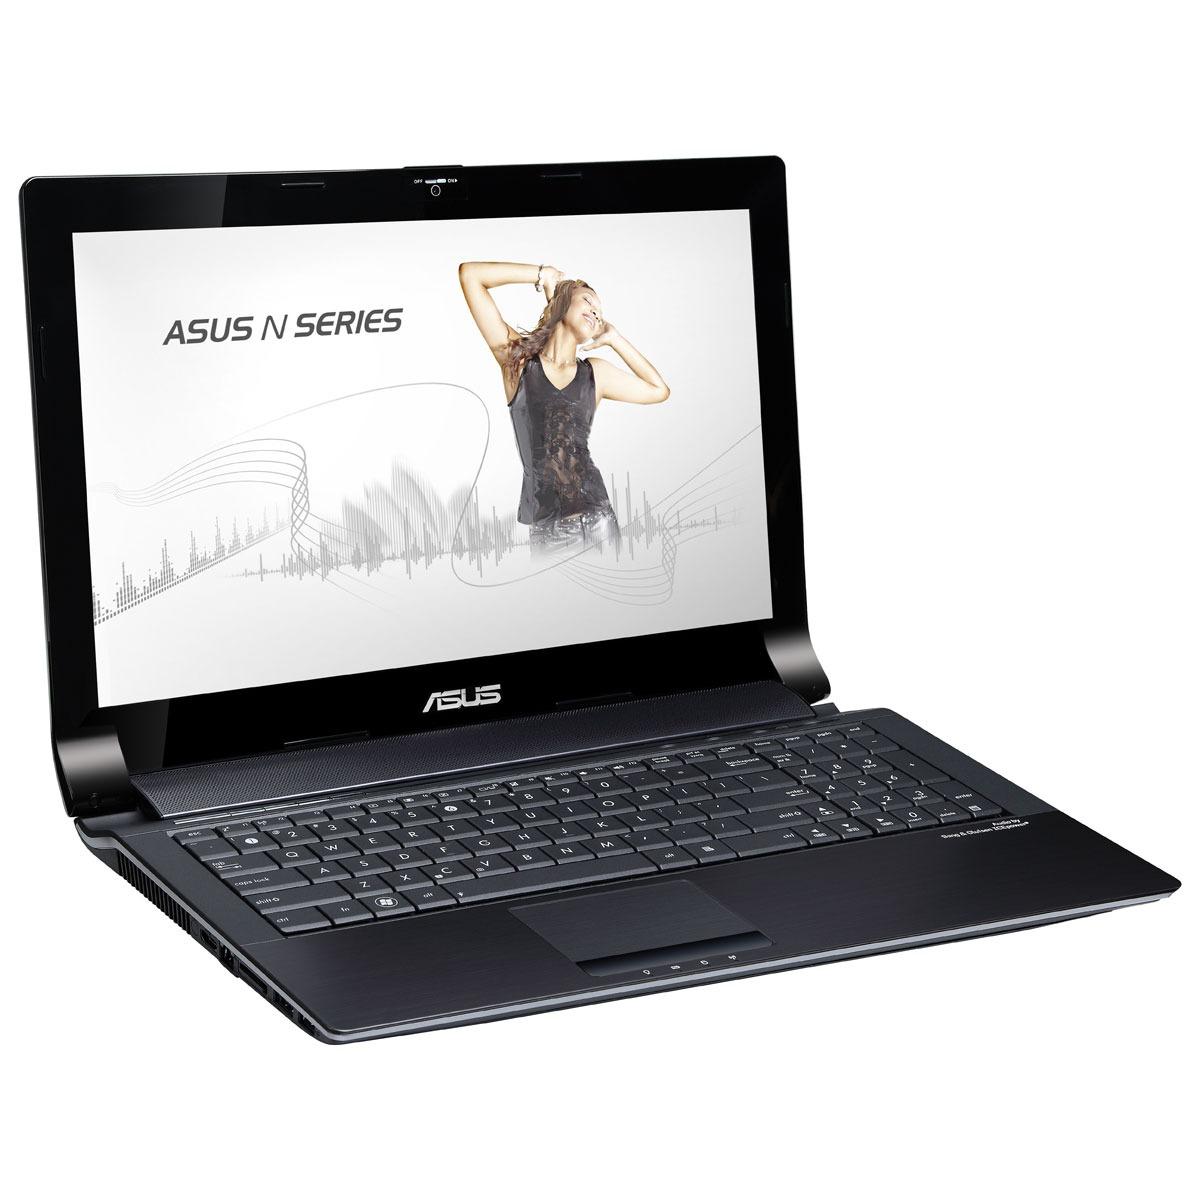 "PC portable ASUS N53SN-SZ008V ASUS N53SN-SZ008V - Intel Core i7-2630QM 6 Go 640 Go 15.6"" LED NVIDIA GeForce GT 550M Combo Lecteur Blu-ray/Graveur DVD Wi-Fi N/Bluetooth Webcam Windows 7 Premium 64 bits (garantie constructeur 2 ans)"